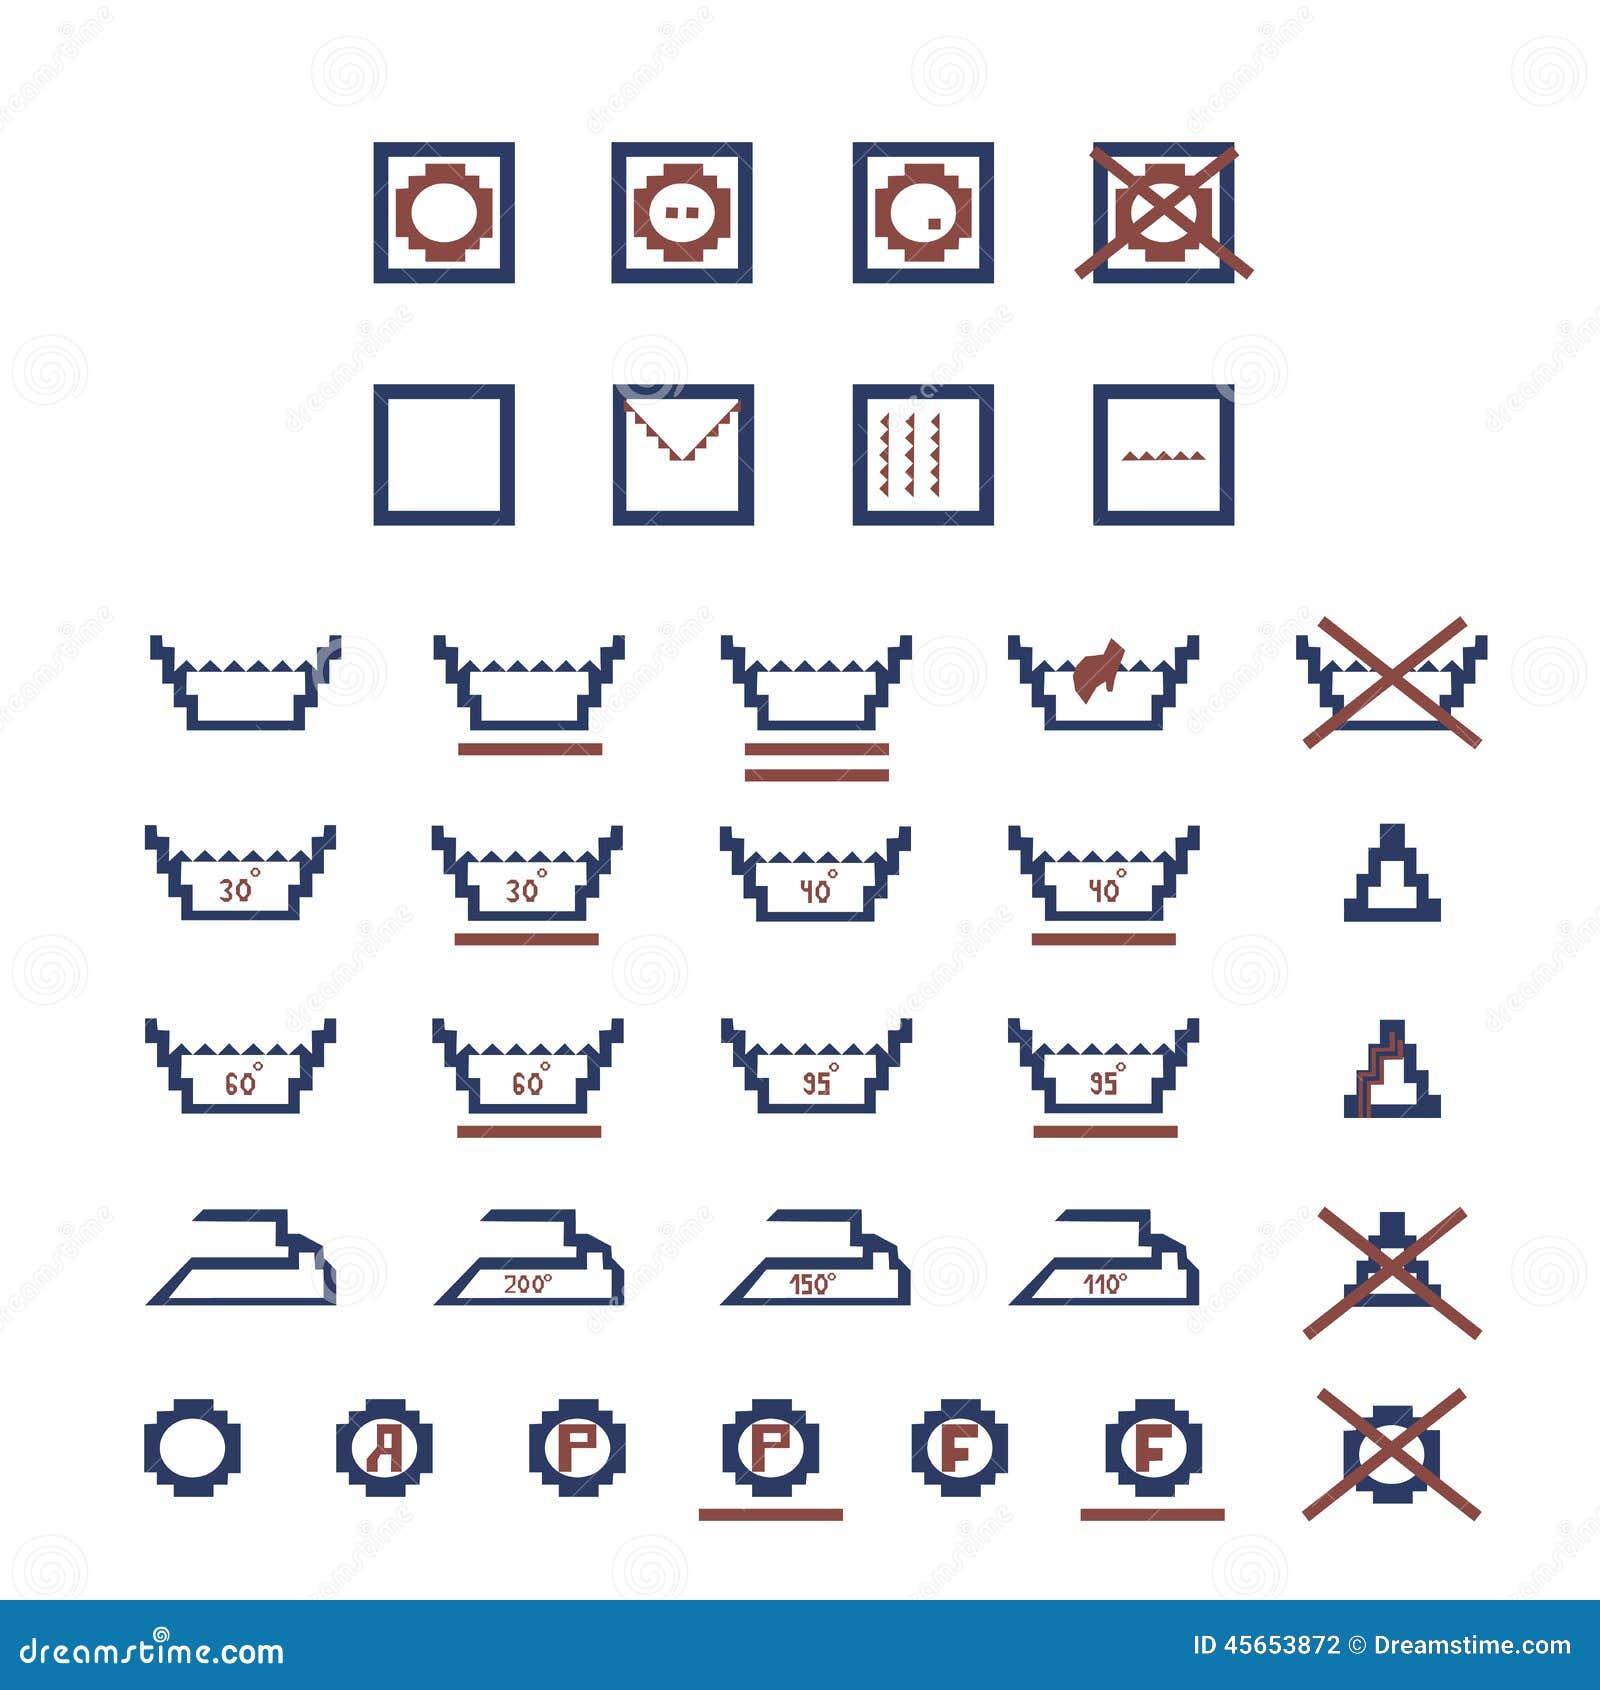 Laundry Care Symbols Stock Vector Illustration Of Label 45653872